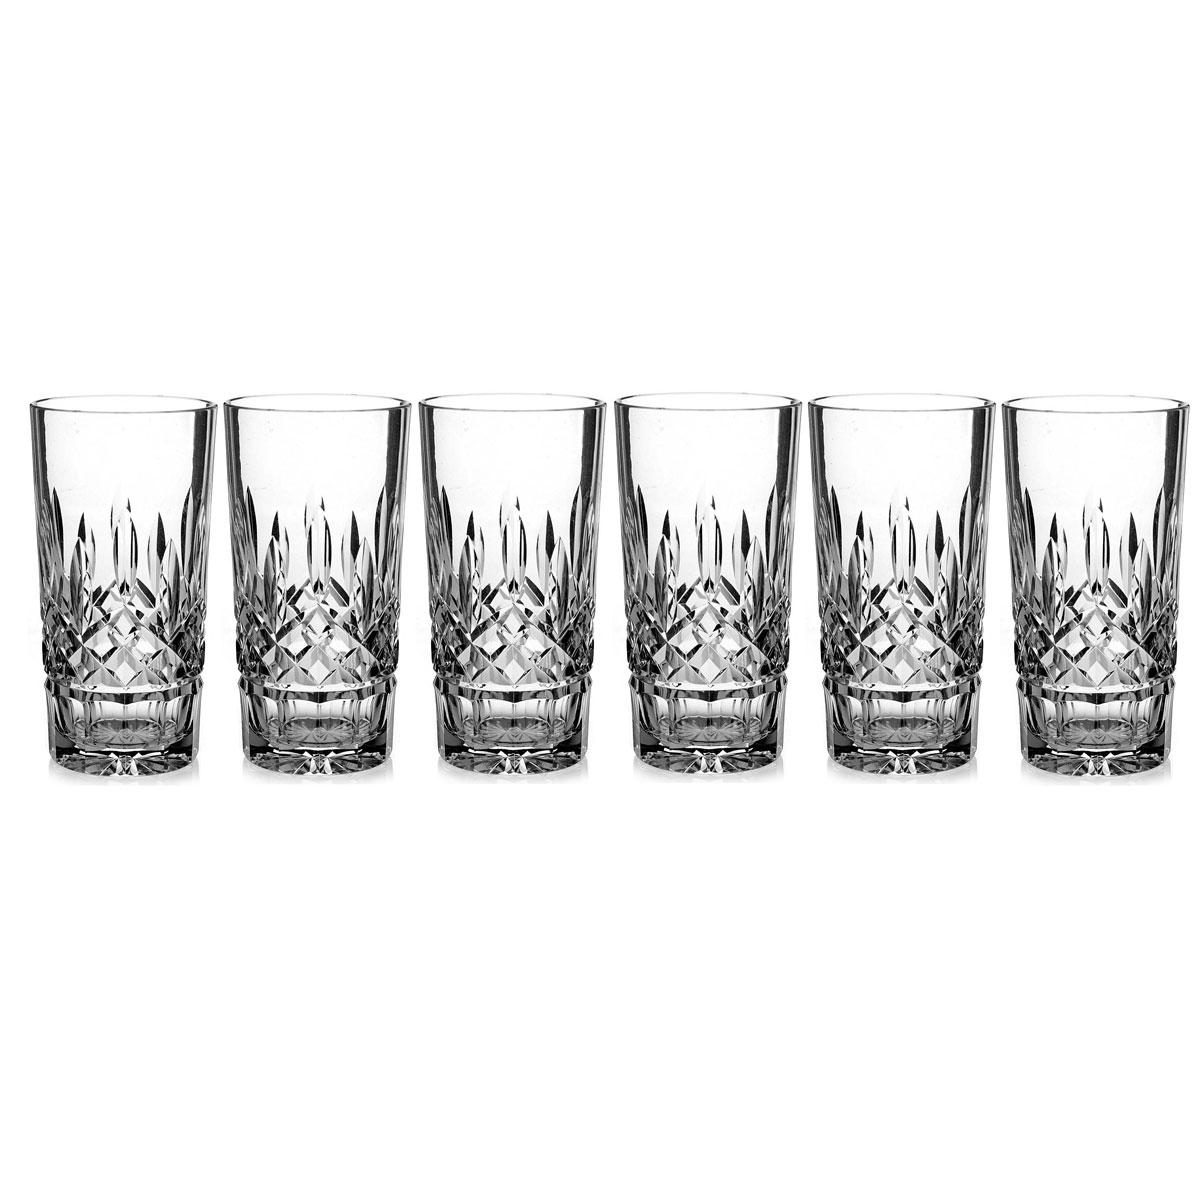 Waterford Crystal, Lismore Hiball Tumbler, Boxed Set 5+1 Free